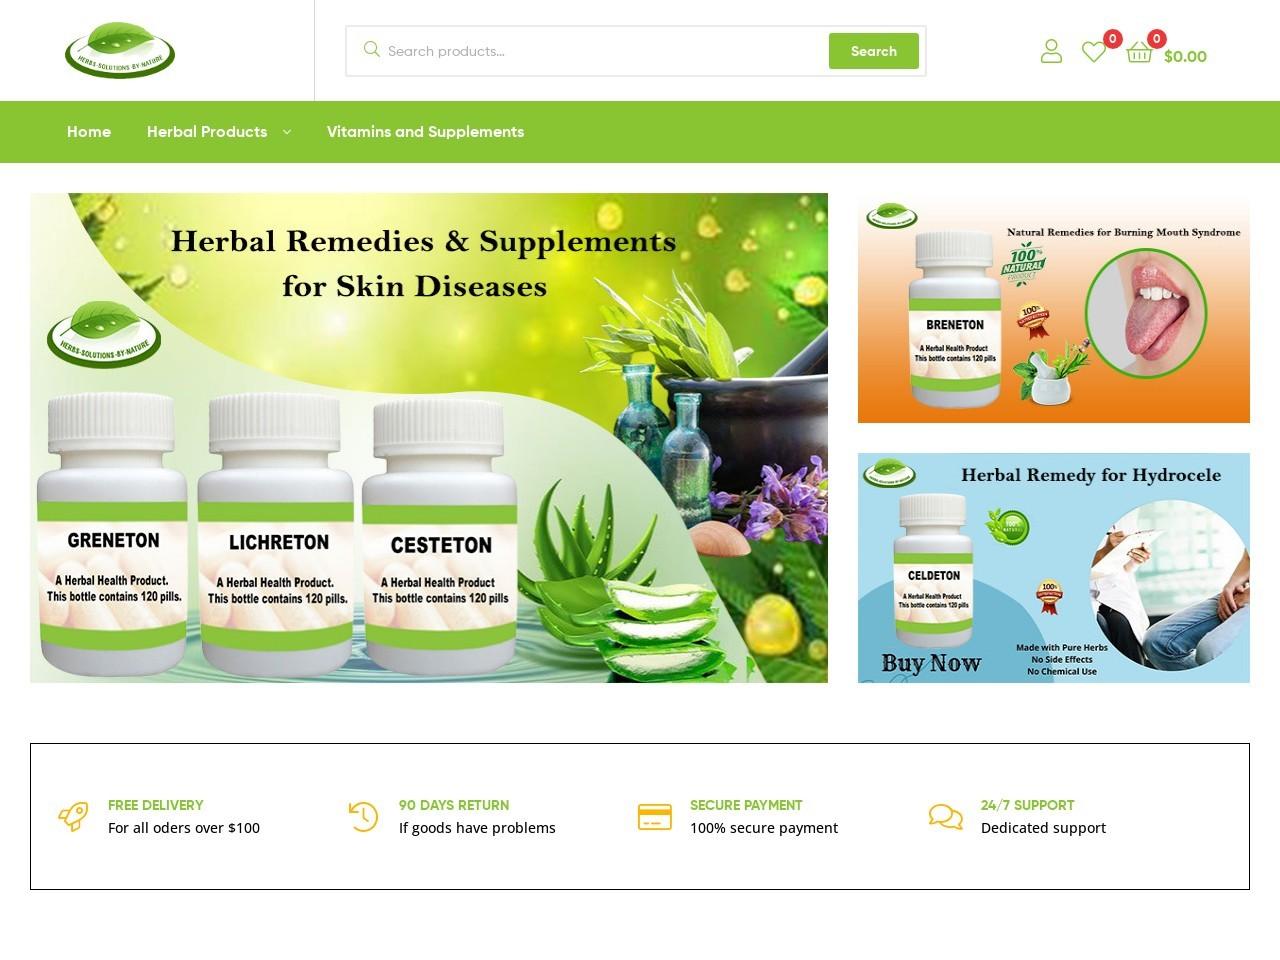 Benefits of Herbal Remedies and Natural Ingredients